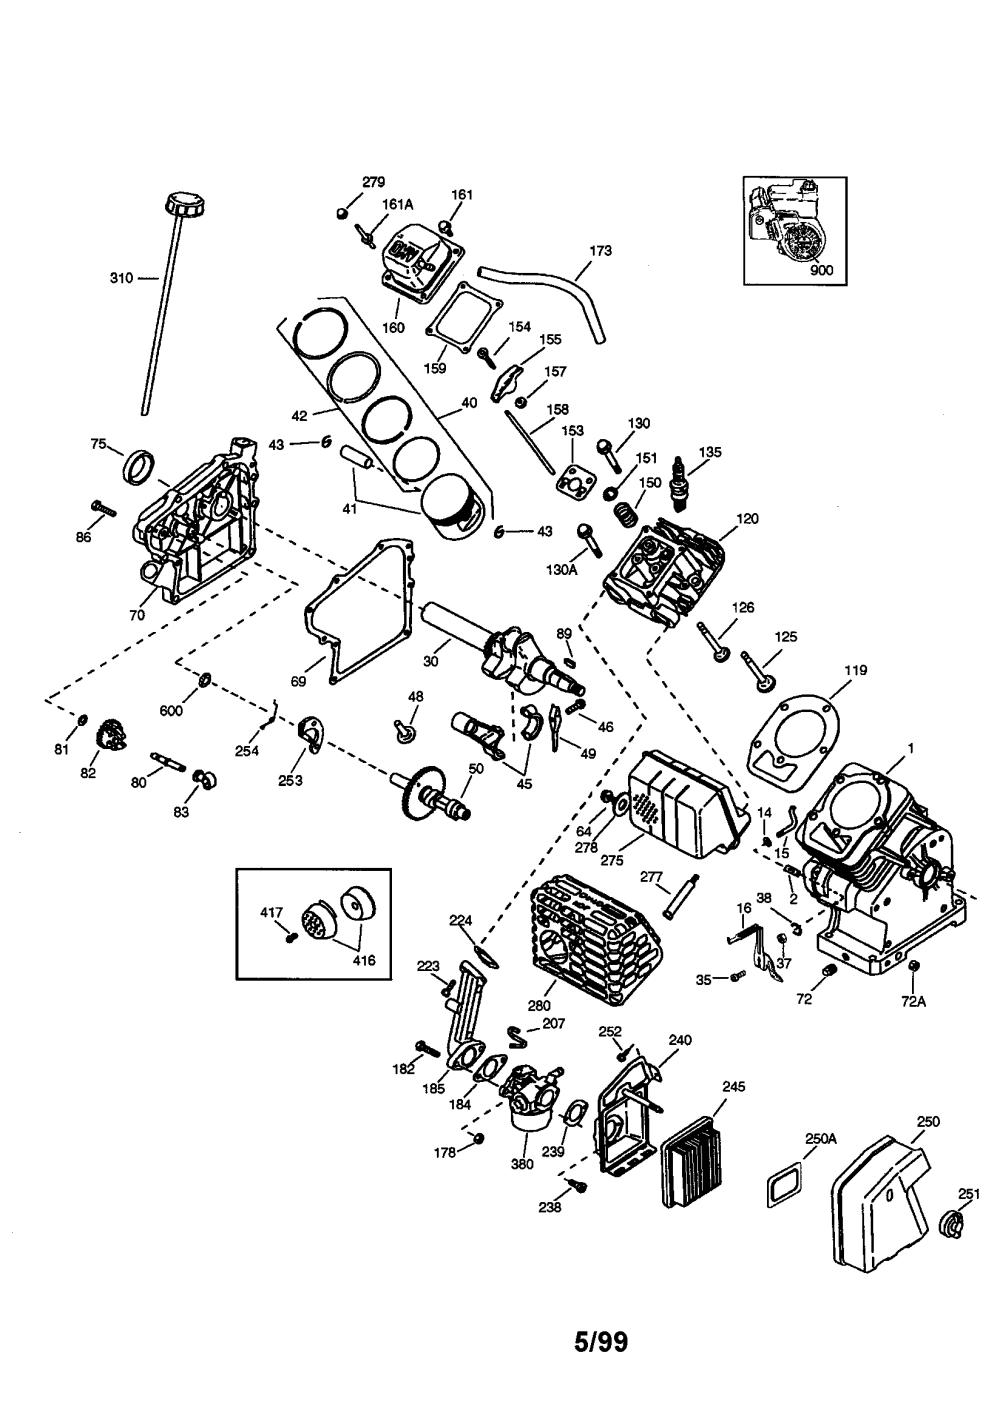 medium resolution of tecumseh ohh60 71131c tecumseh 4 cycle engine diagram